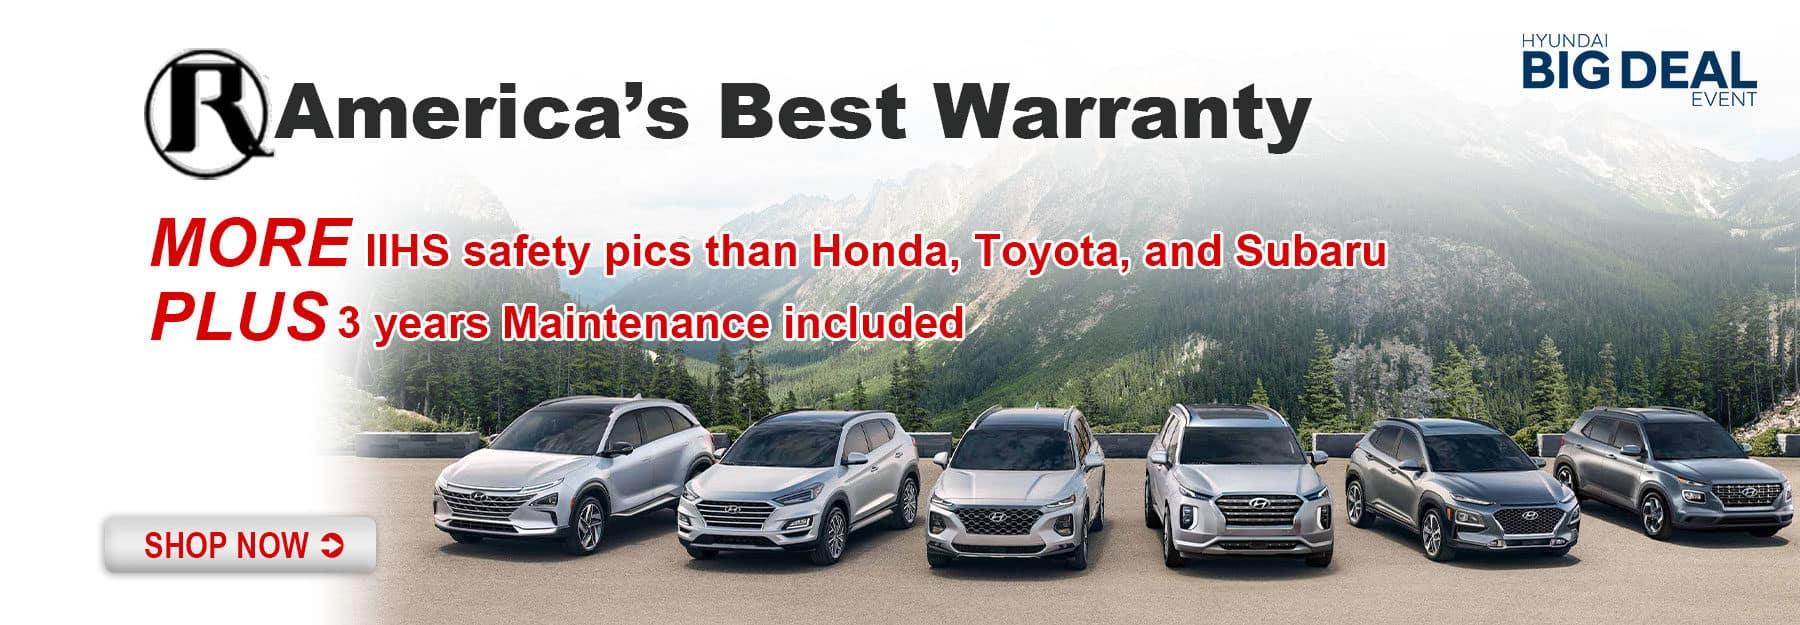 Reed Hyundai America's Best Warranty